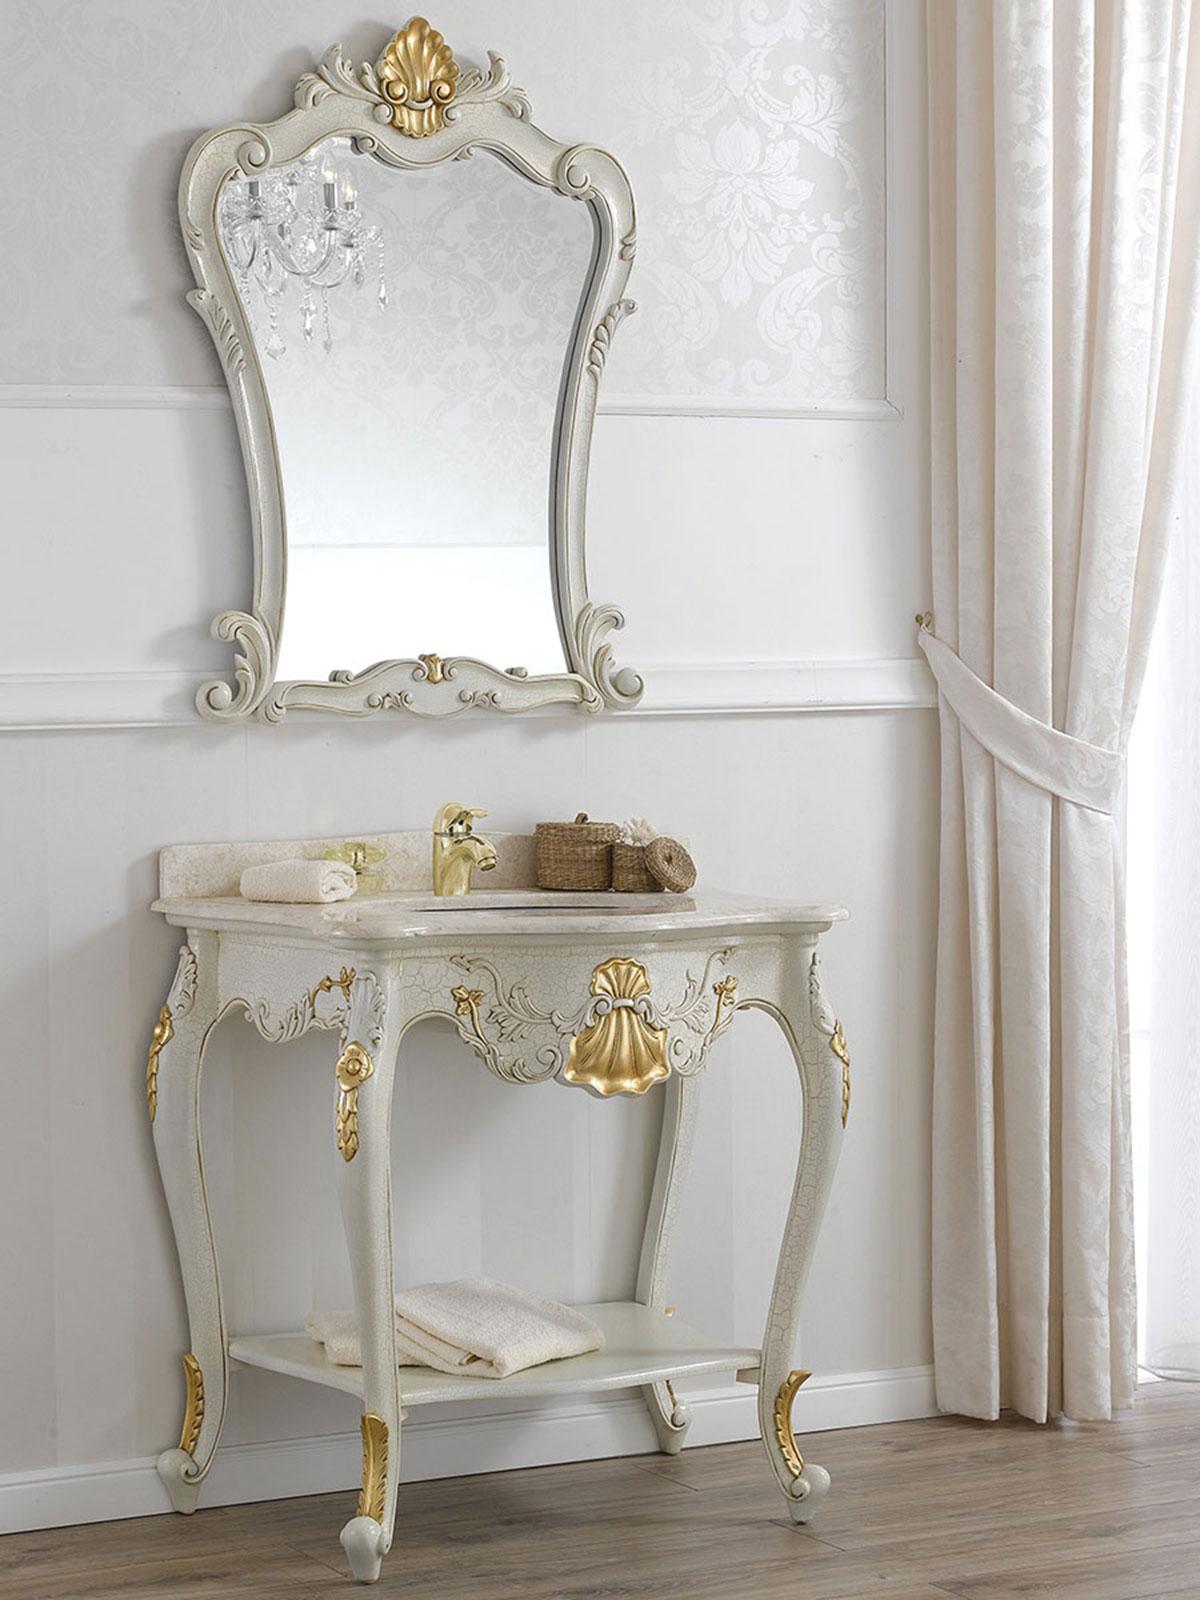 console meuble salle de bain avec miroir eleonor style. Black Bedroom Furniture Sets. Home Design Ideas